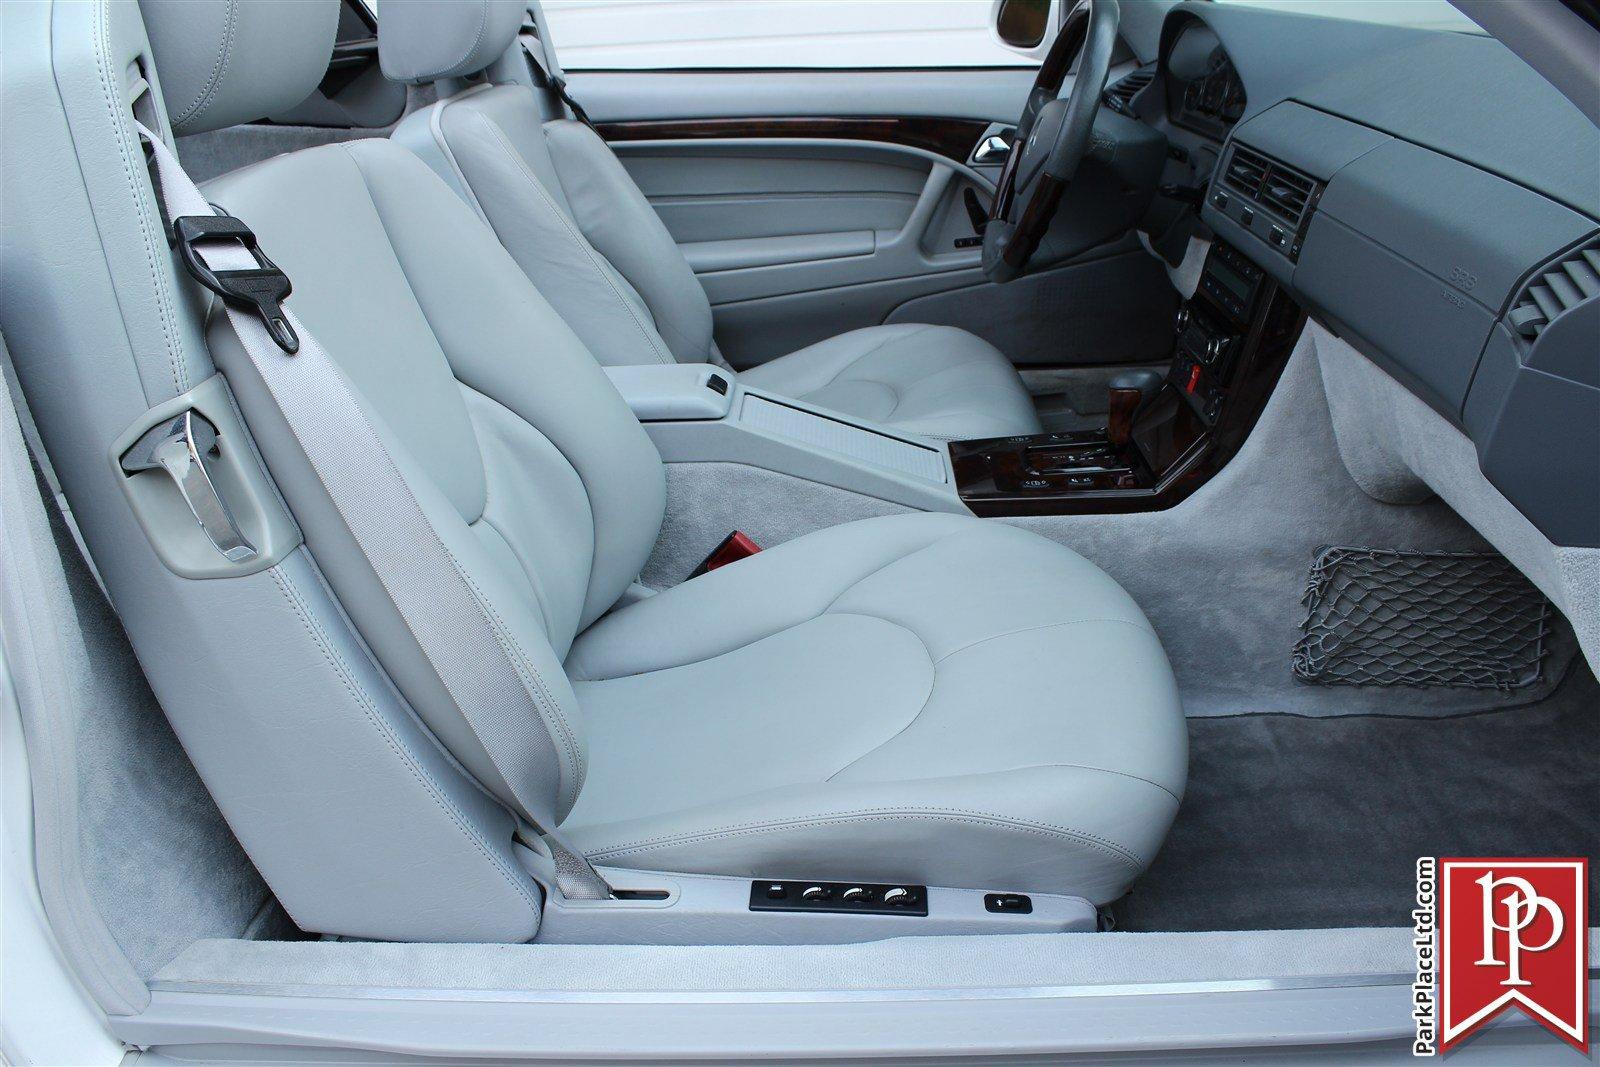 Used 2000 Mercedes-Benz SL500